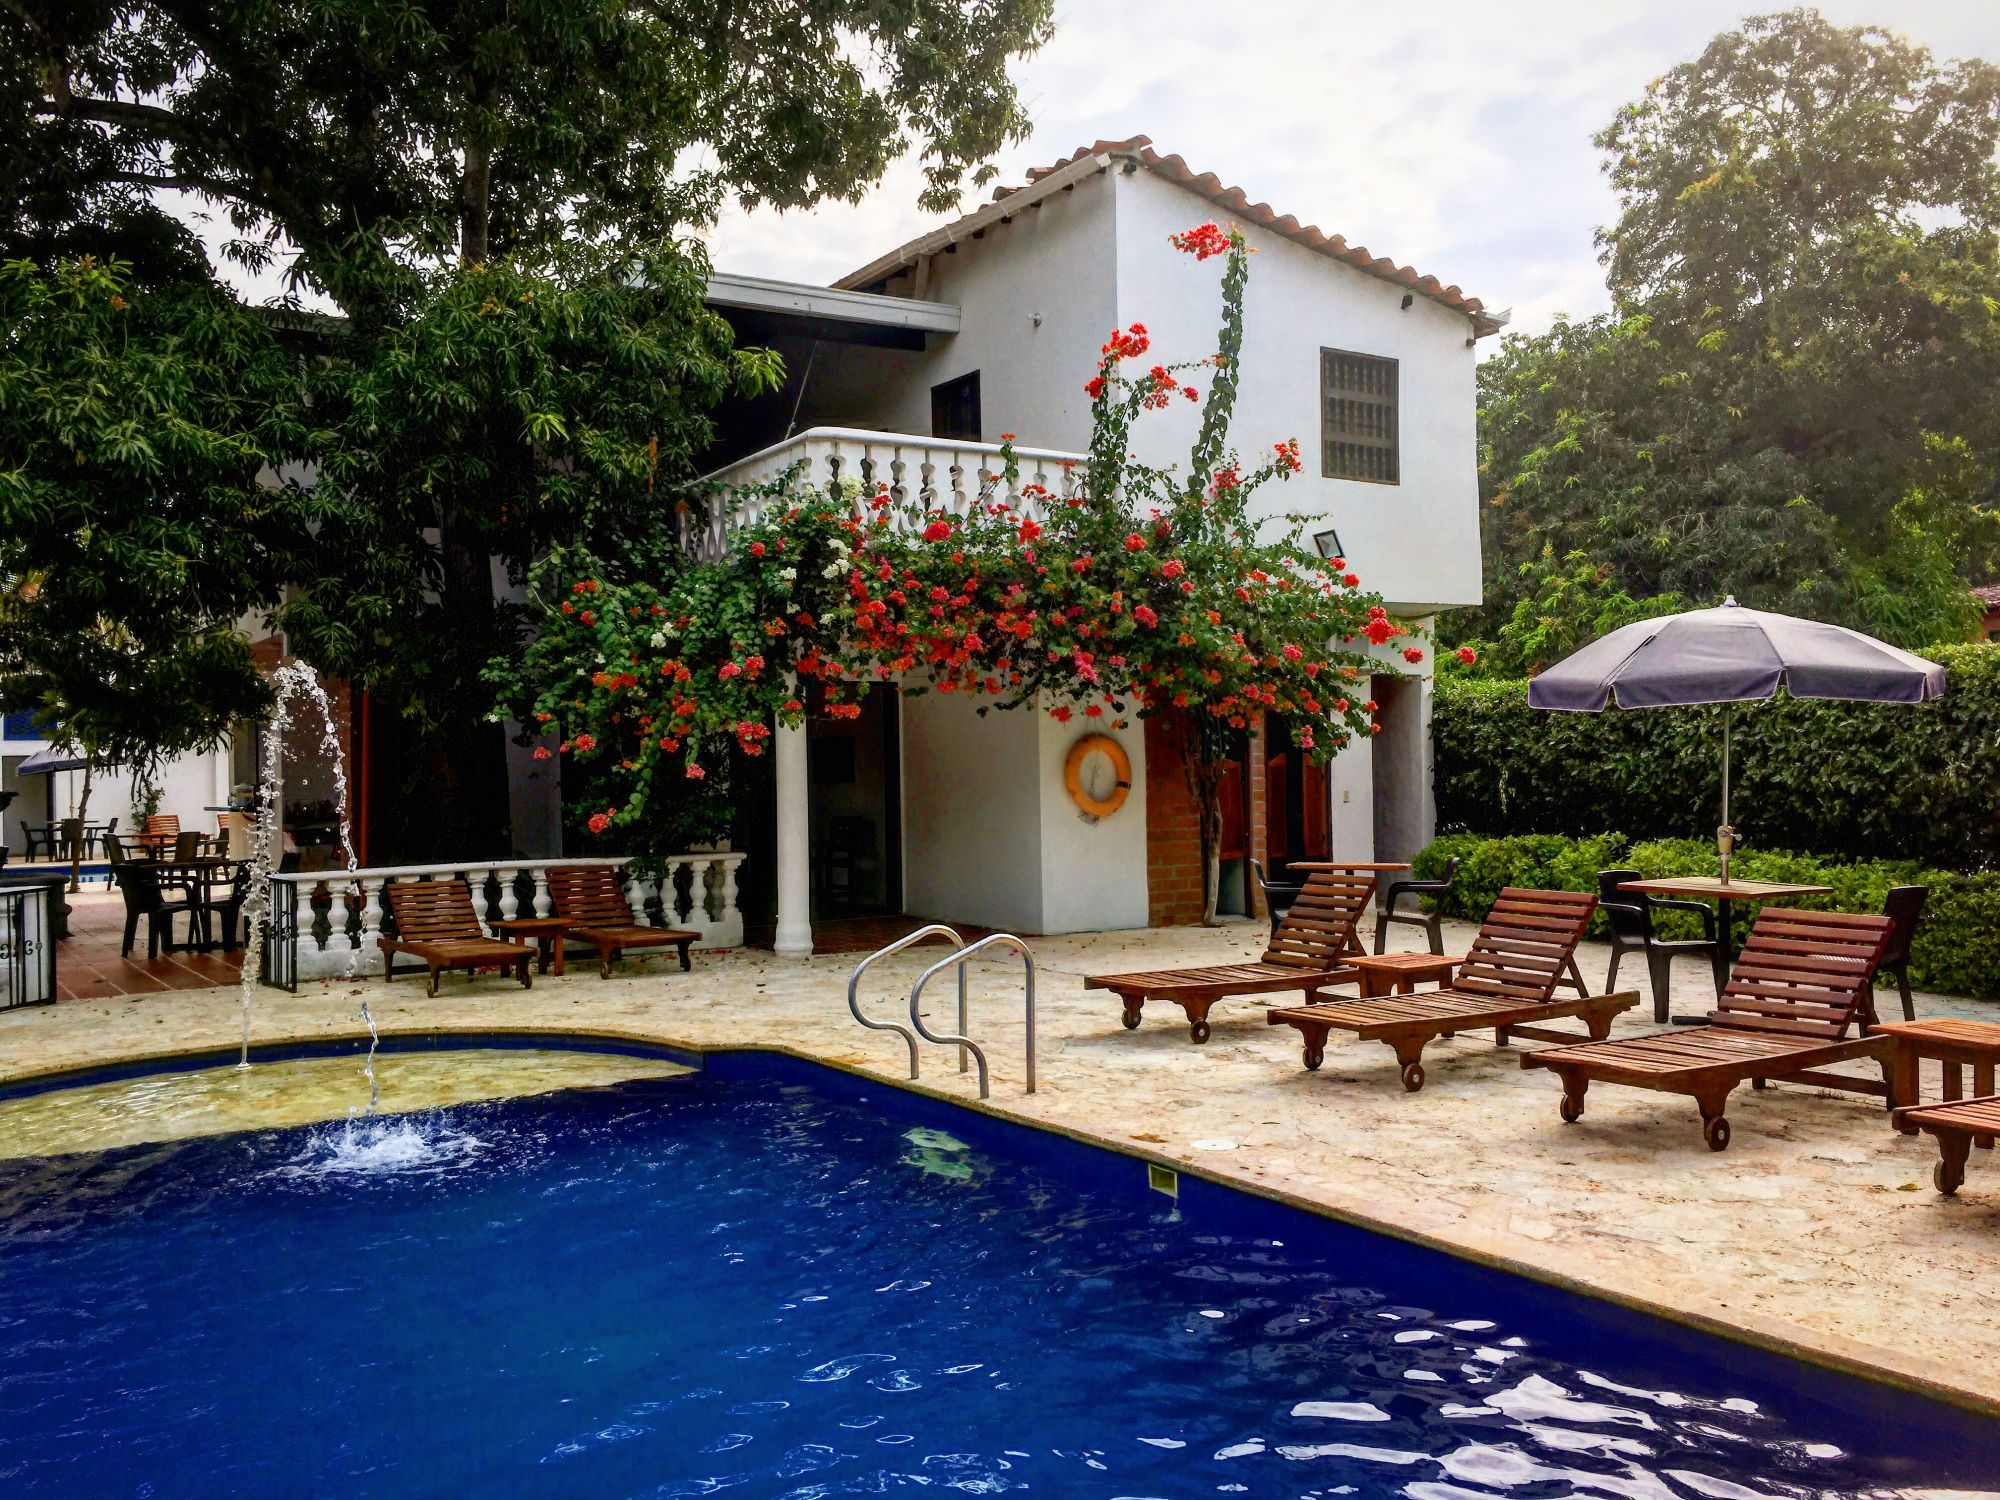 Property rentals in Santa Fe de Antioquia